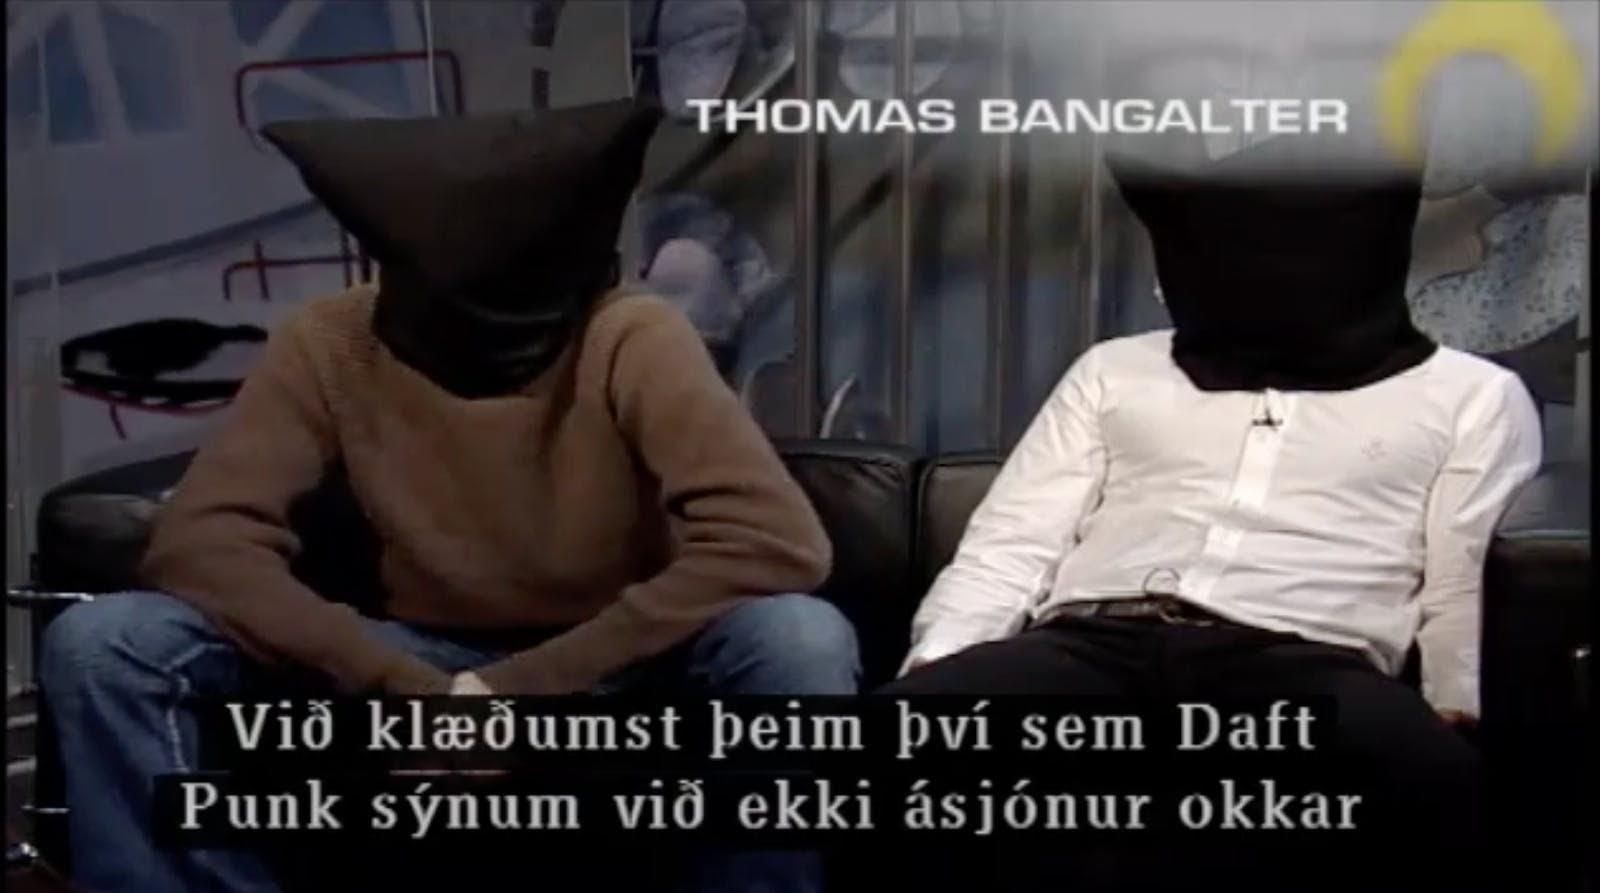 Daft Punk keeping their anonymity